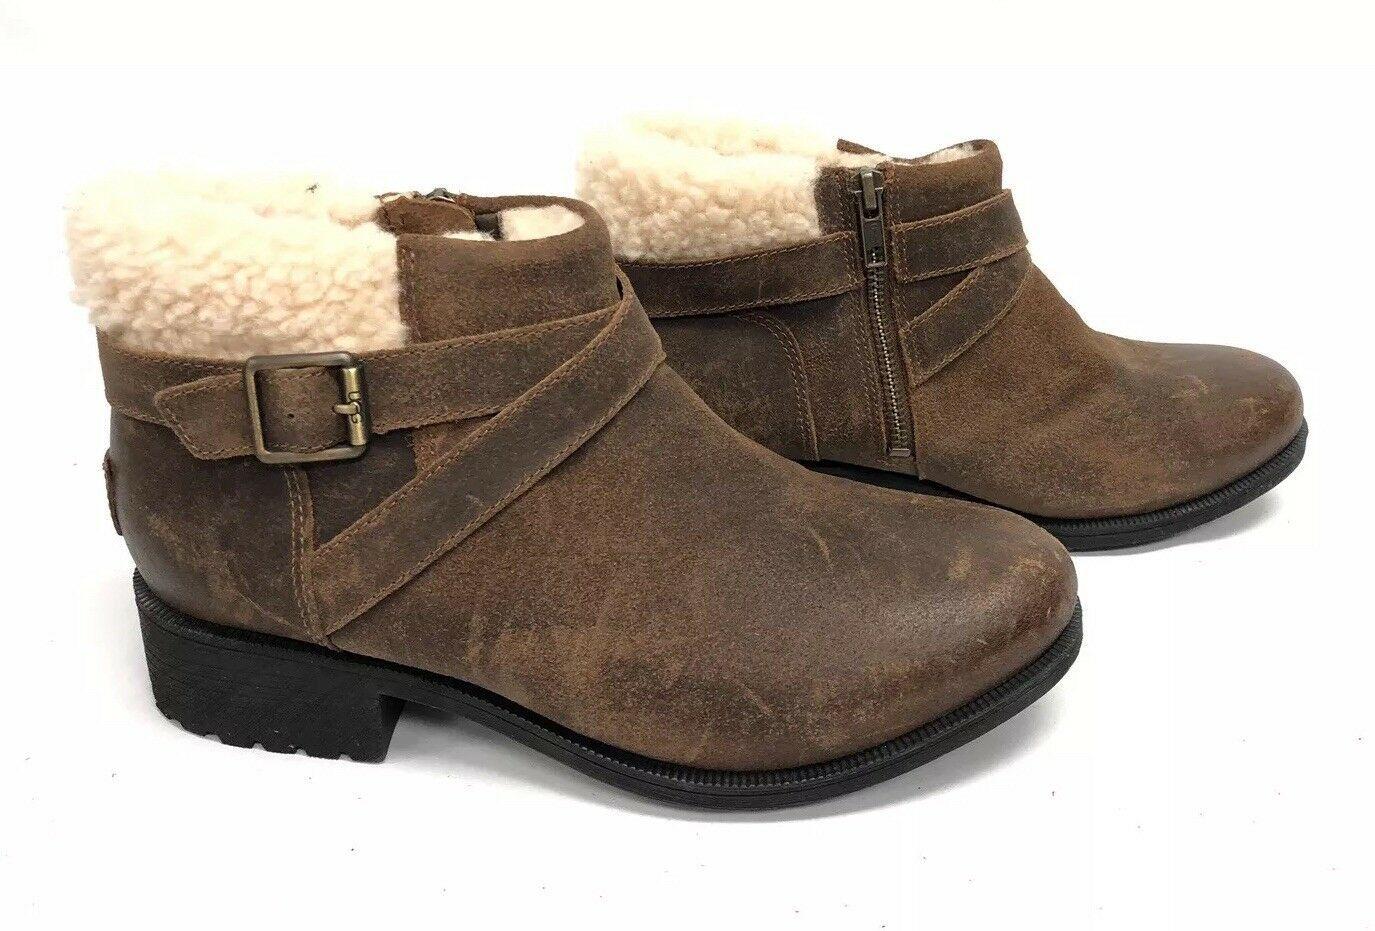 UGG Australia BENSON Buckle Sheepskin Ankle Booties 1095151 Chipmunk Waterproof image 3